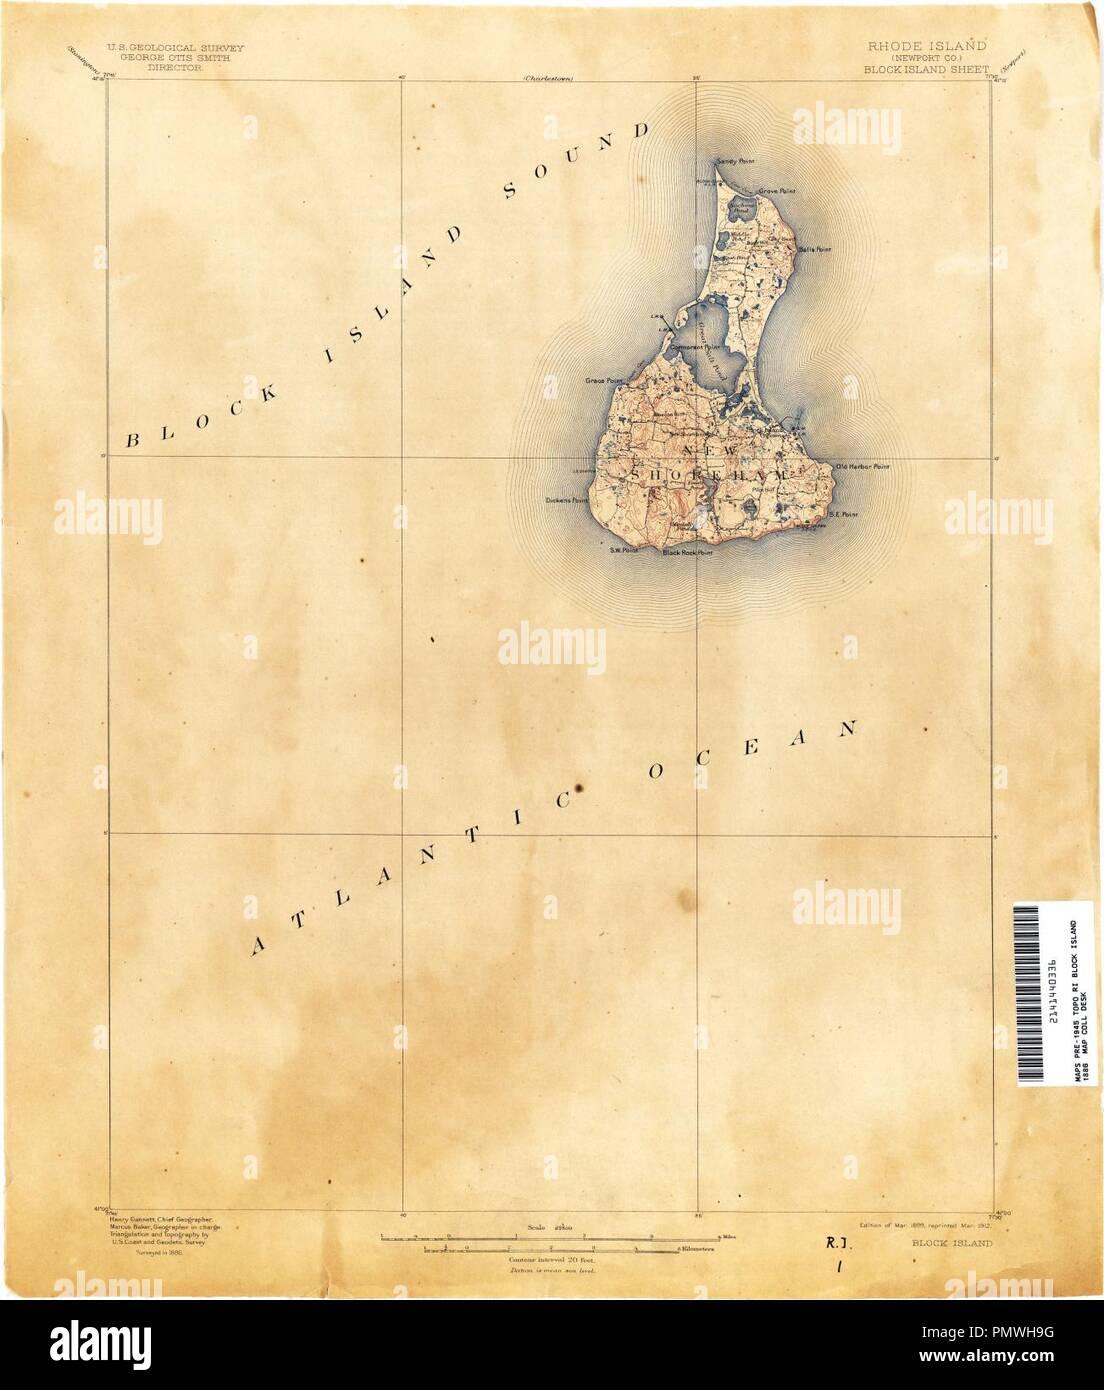 Block Island 1899 USGS map. - Stock Image